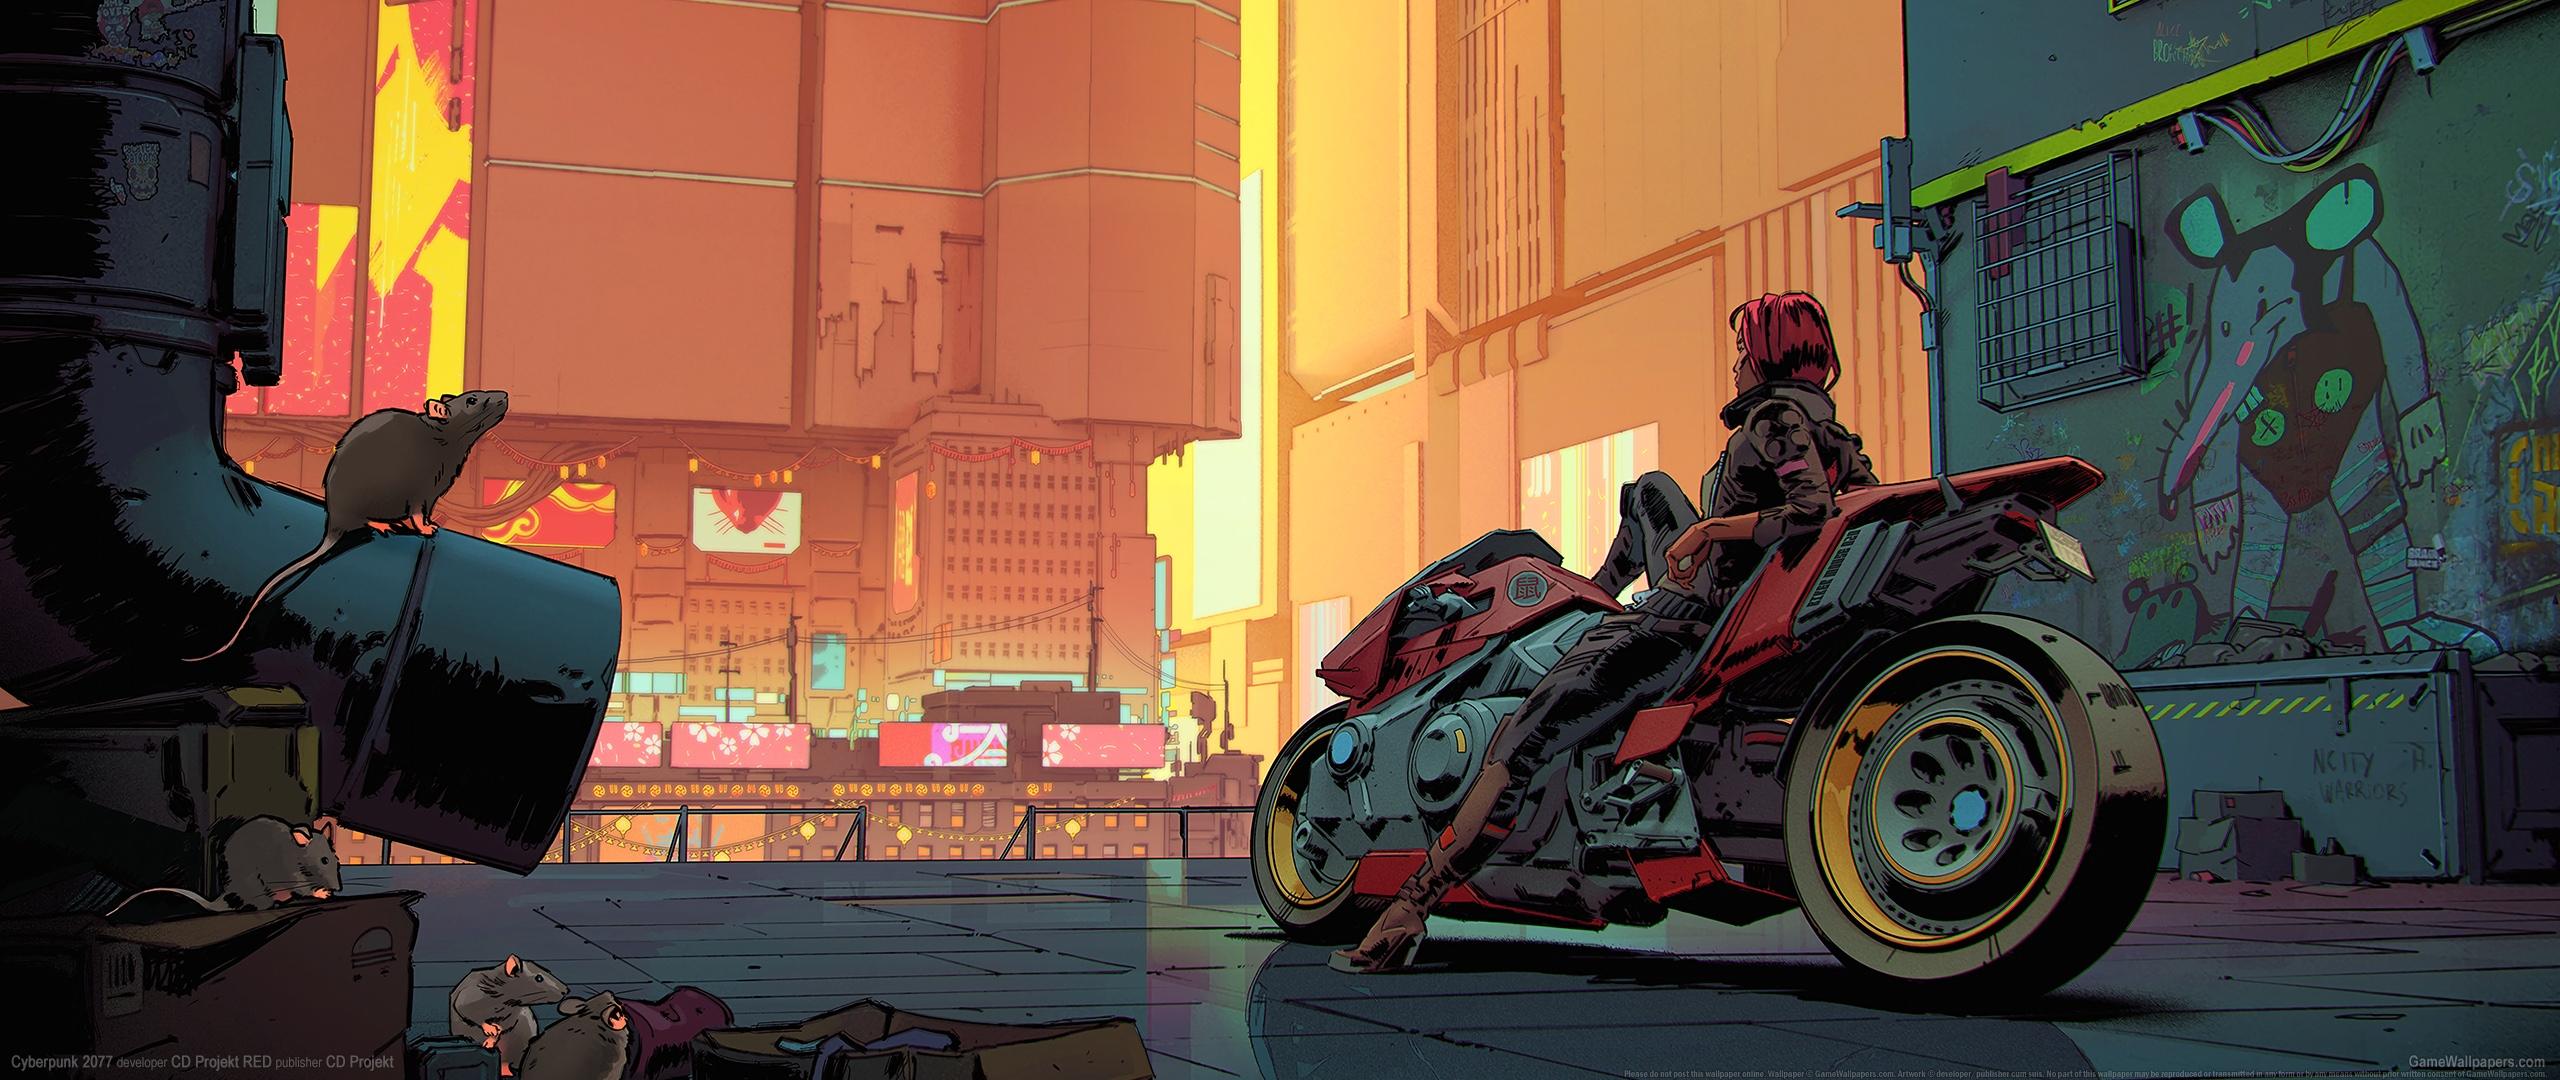 Cyberpunk 2077 2560x1080 fond d'écran 27